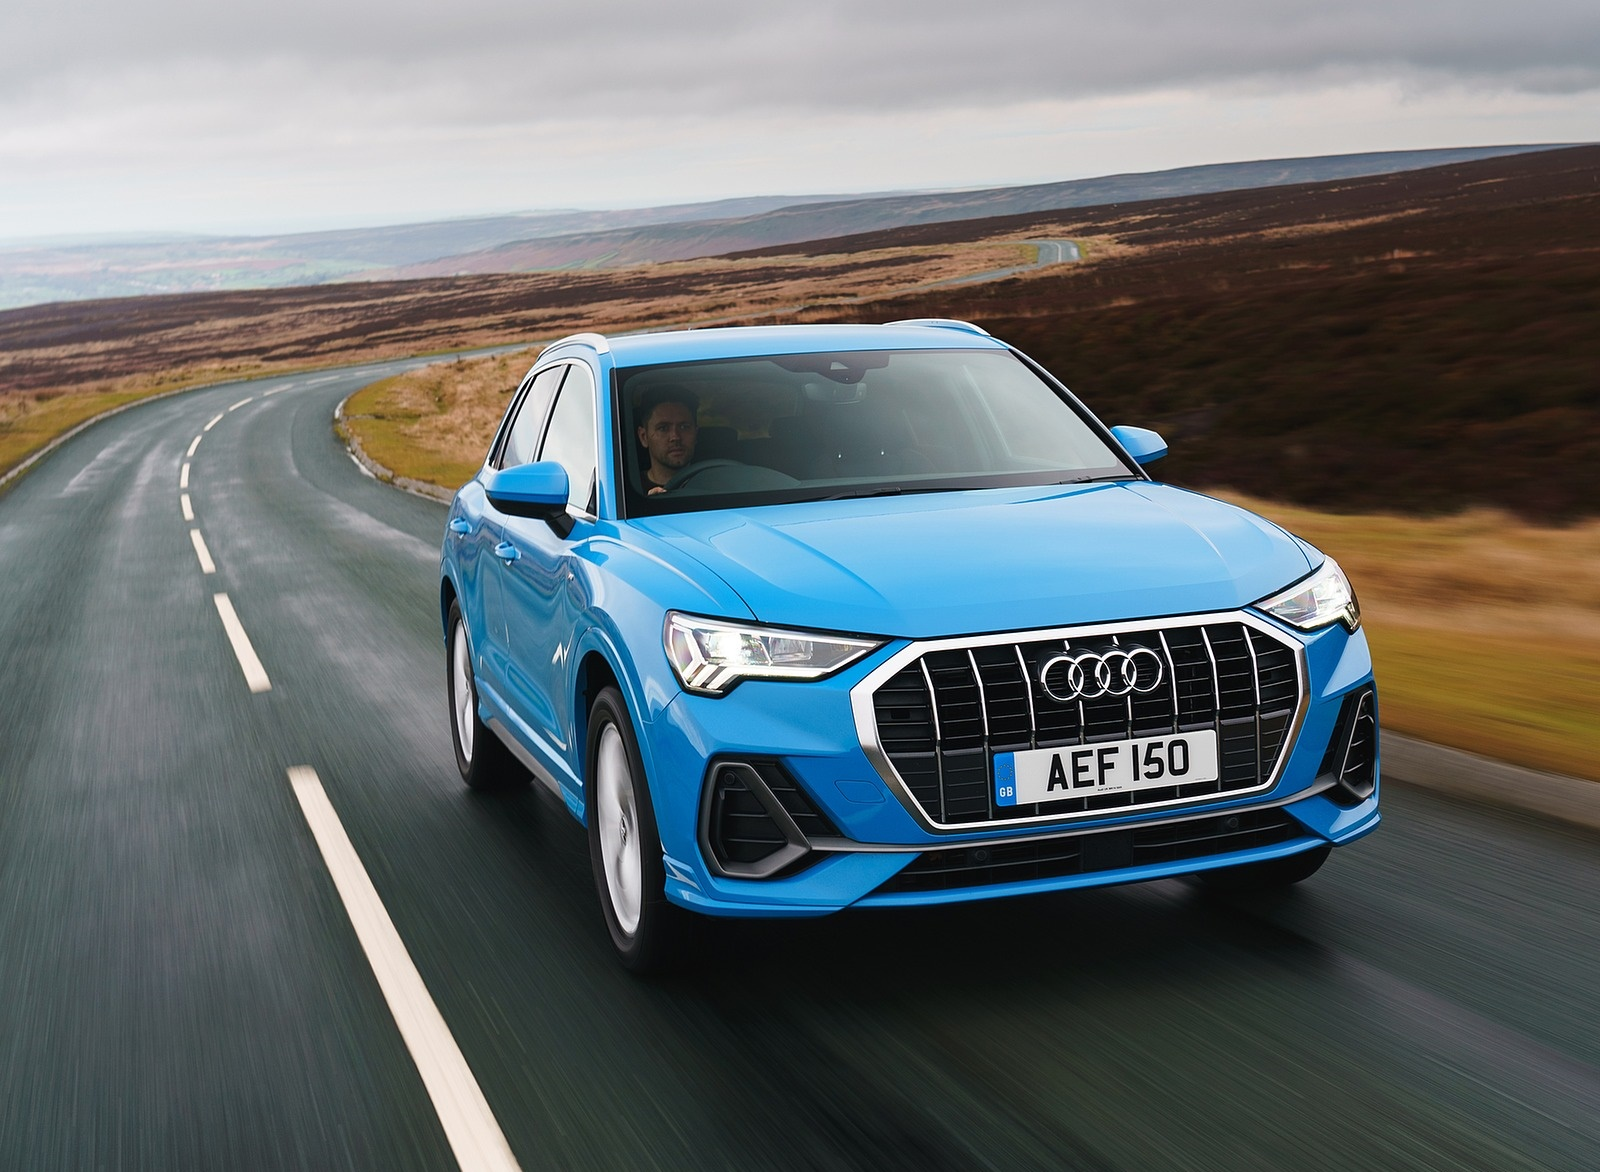 2019 Audi Q3 35 TFSI (UK-Spec) Front Wallpaper (13)